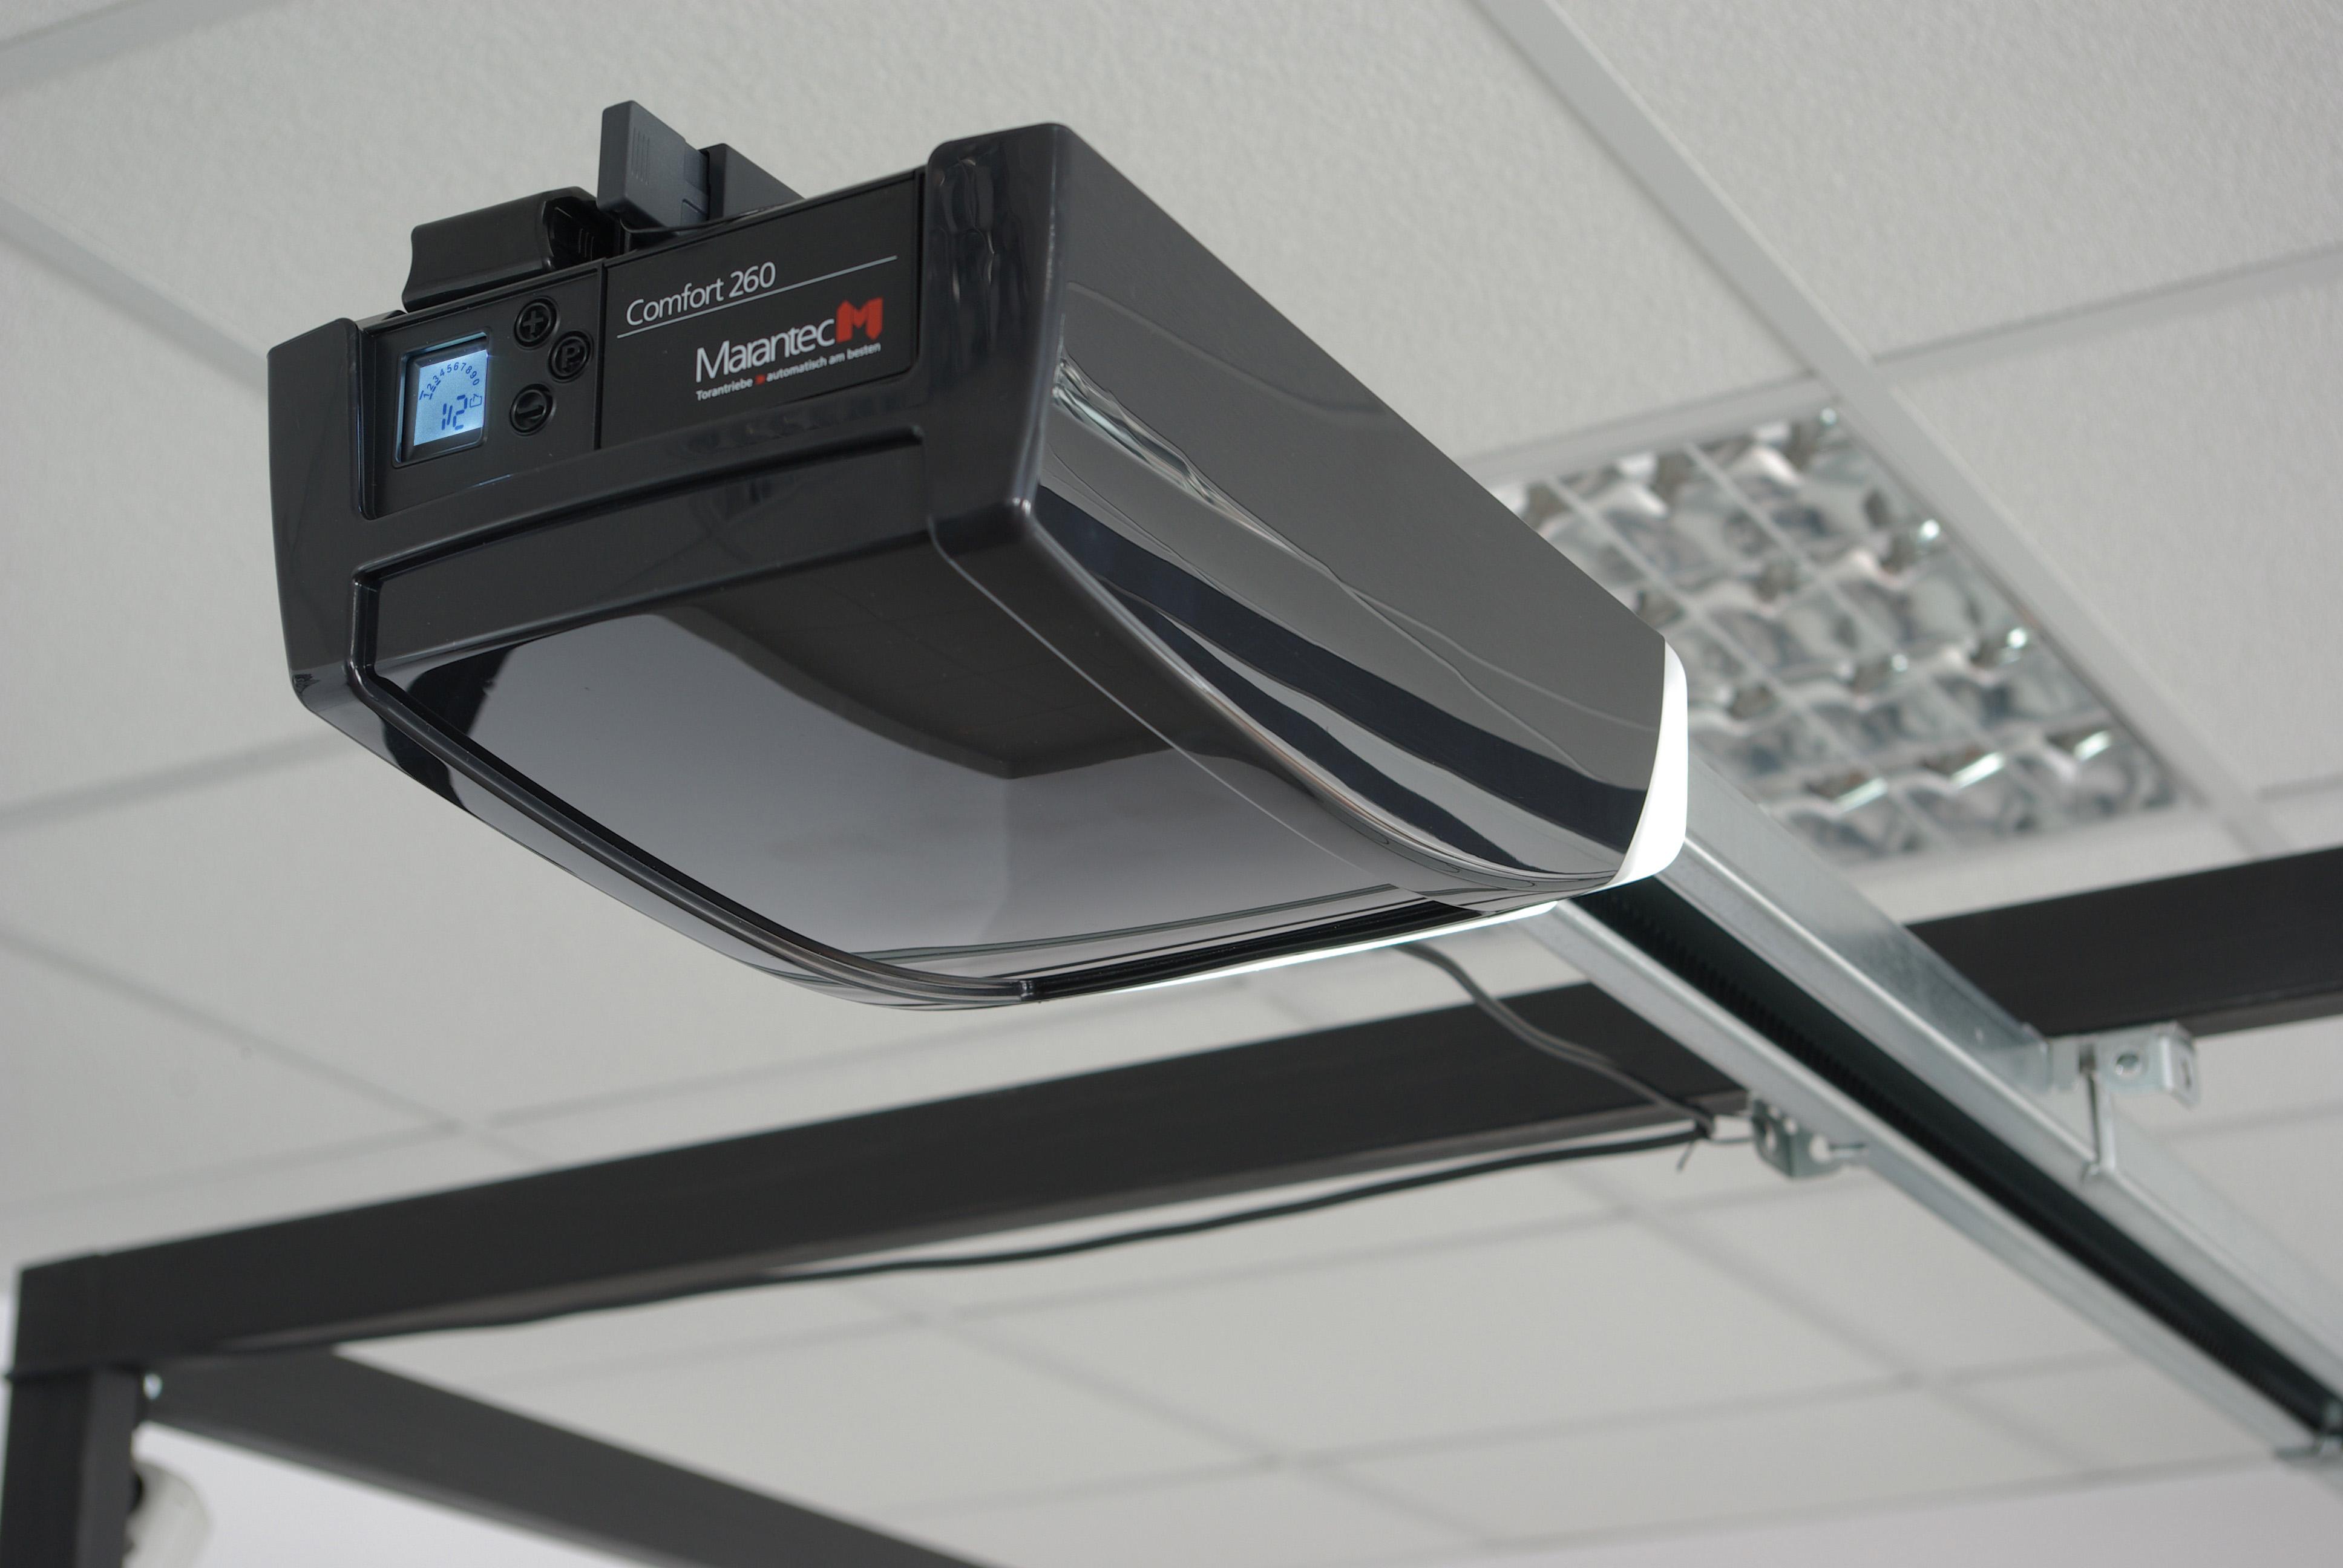 Автоматизация за гаражни врати Comfort 260-280,360-380 - 0